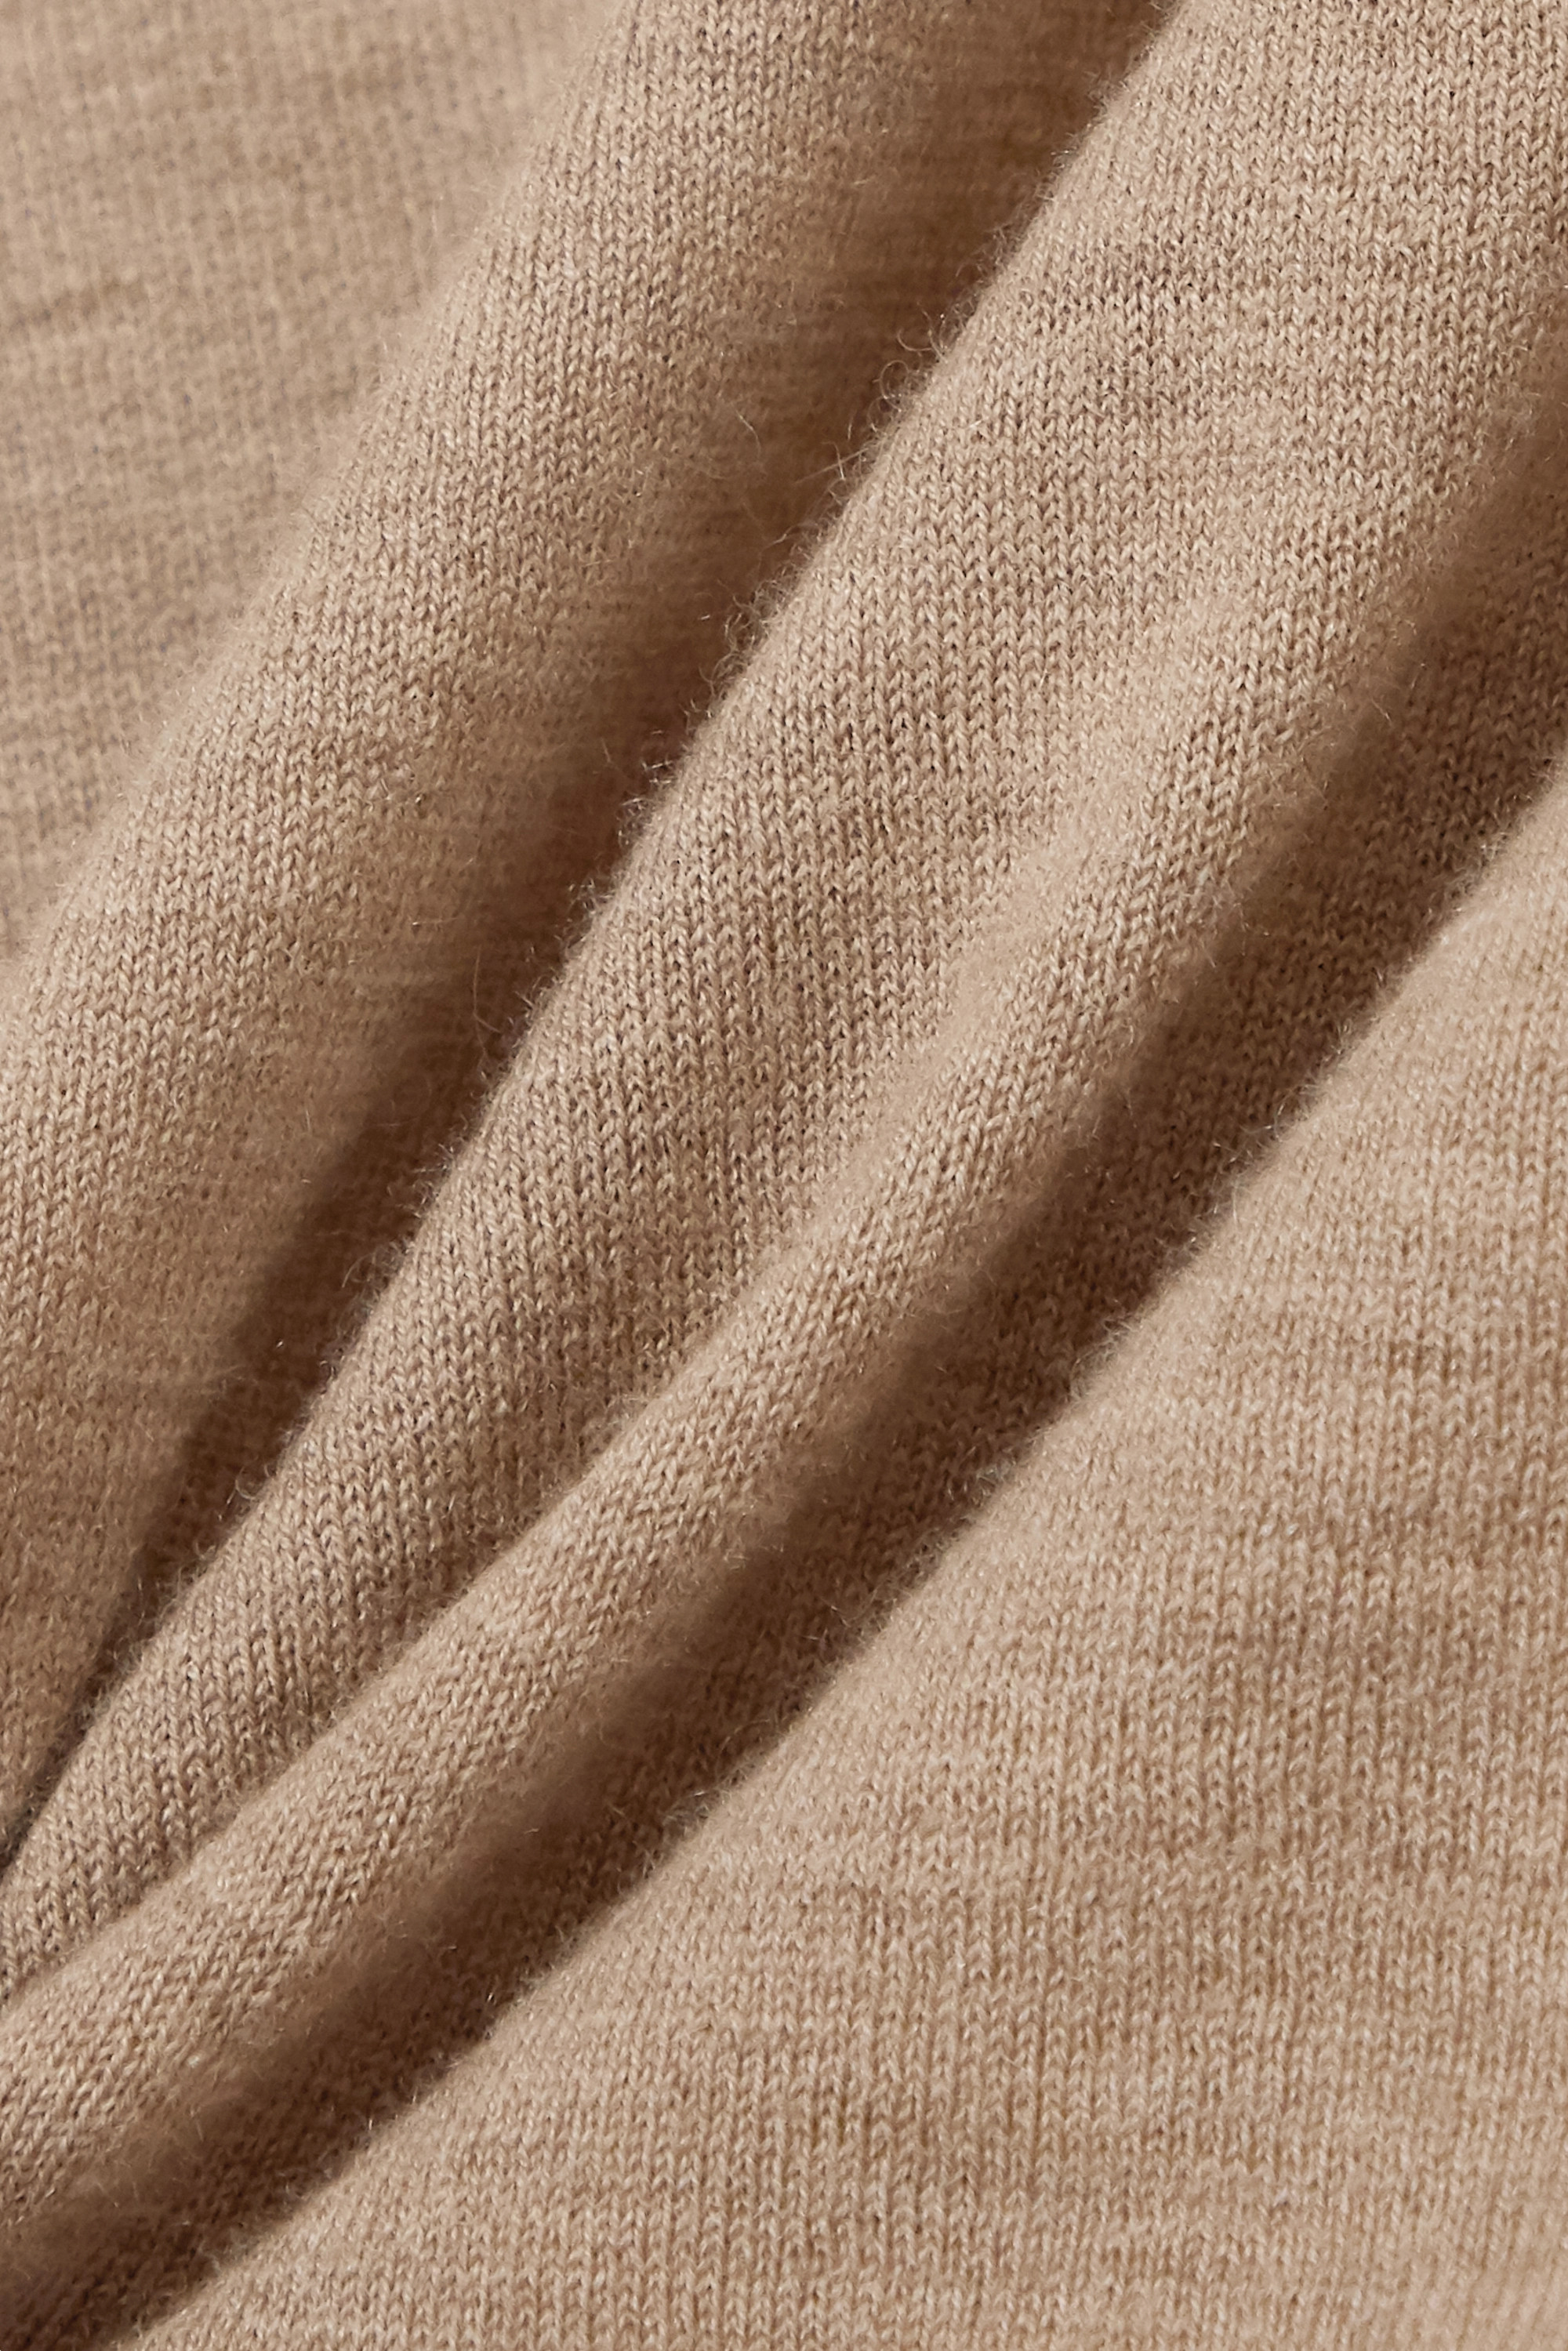 LOULOU STUDIO Prince ärmelloser Pullover aus einer melierten Woll-Kaschmirmischung